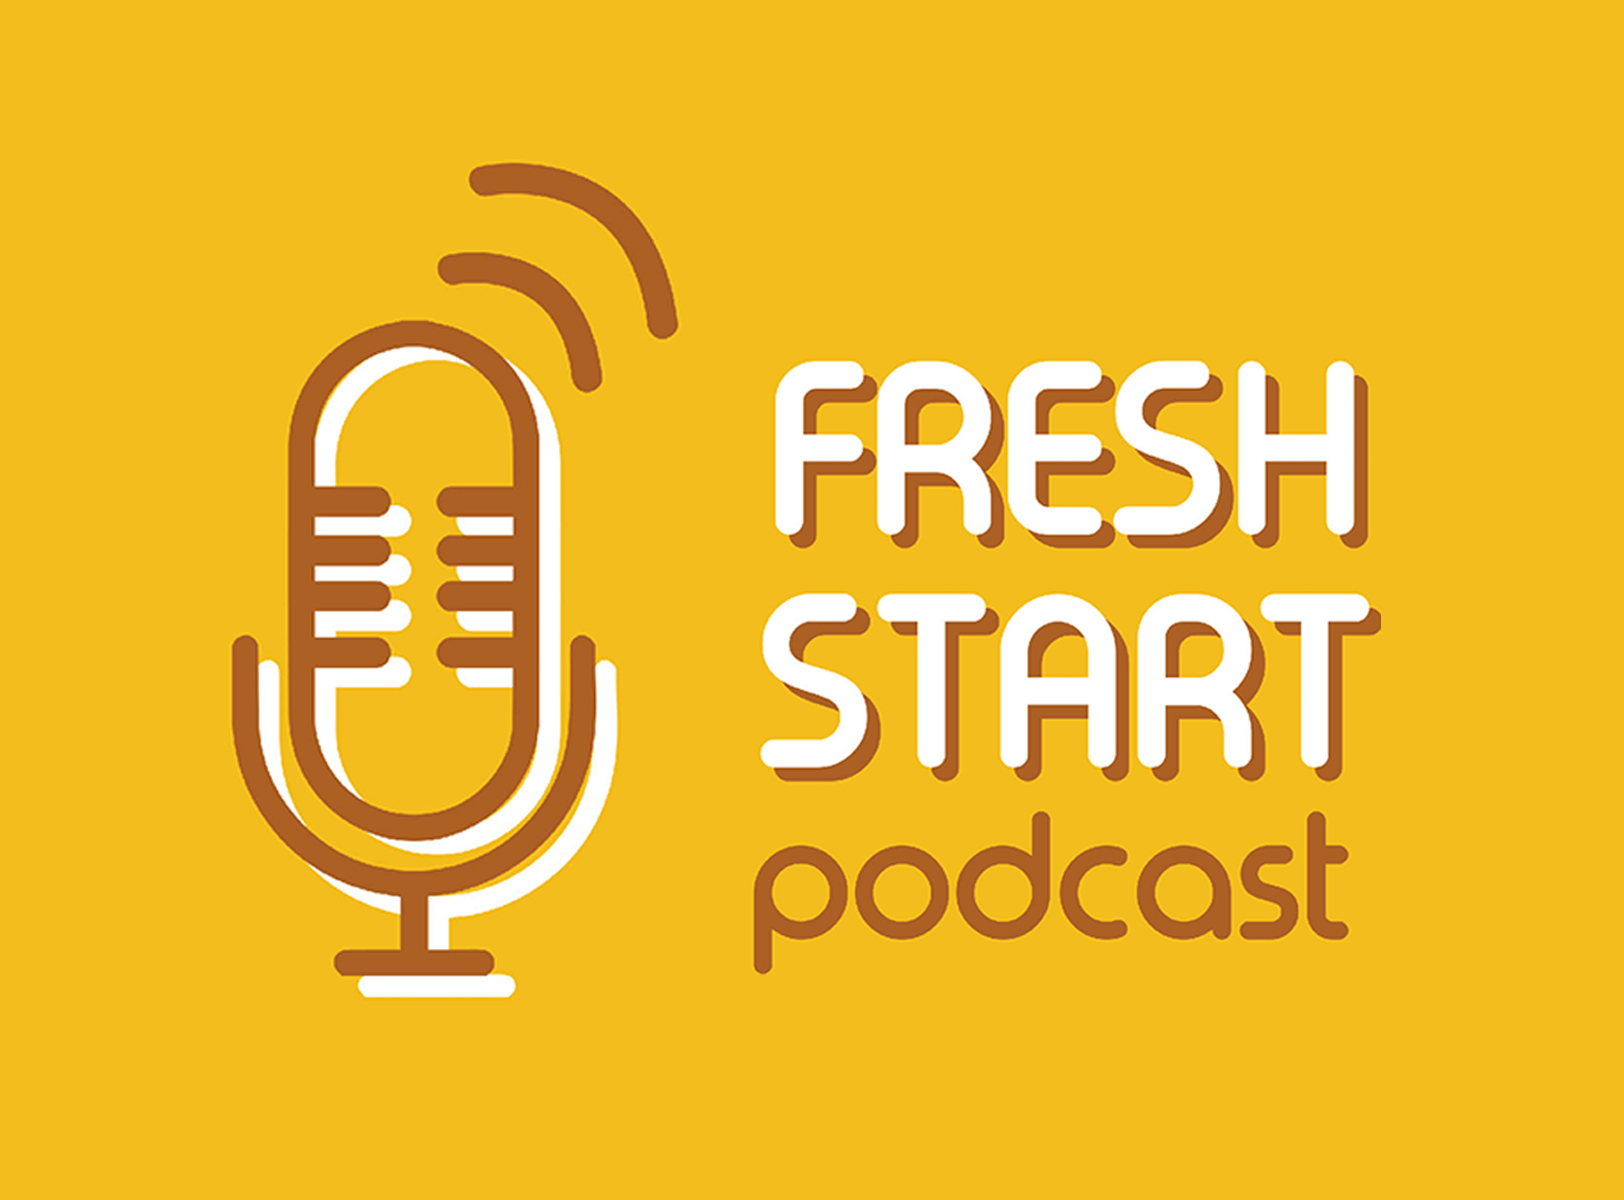 Fresh Start: Podcast News (1/22/2020 Wed.)